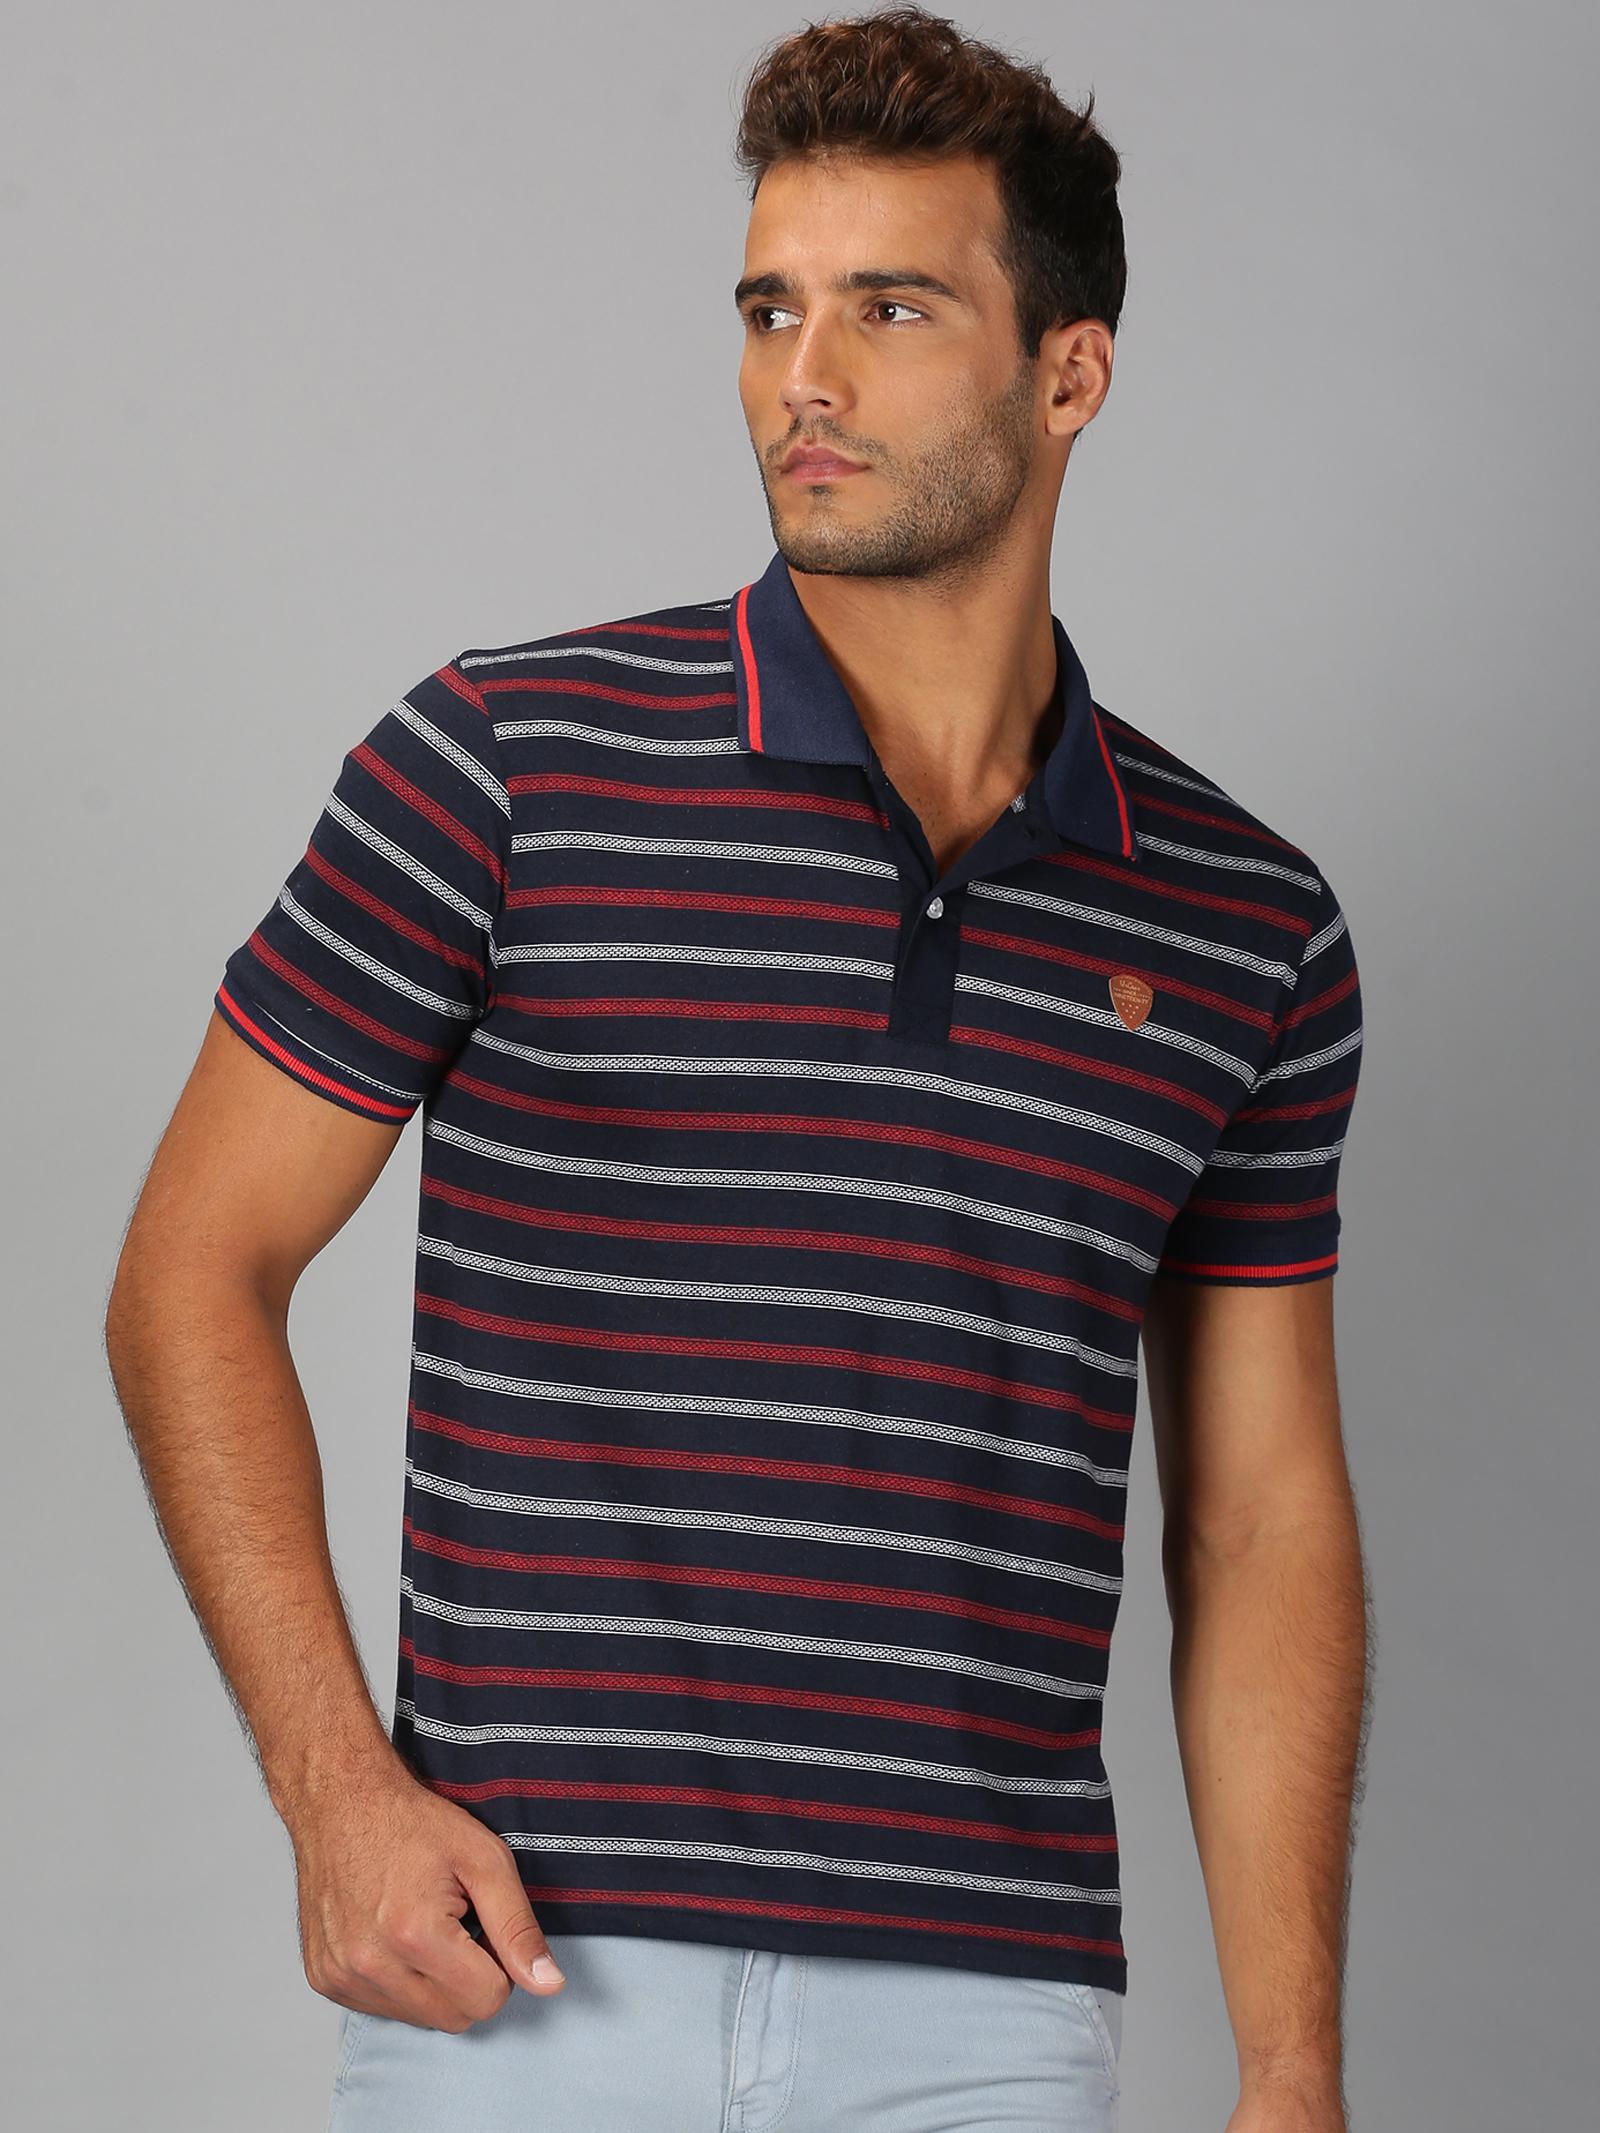 UrGear | Mens Polo Neck Striped Red White T-Shirt